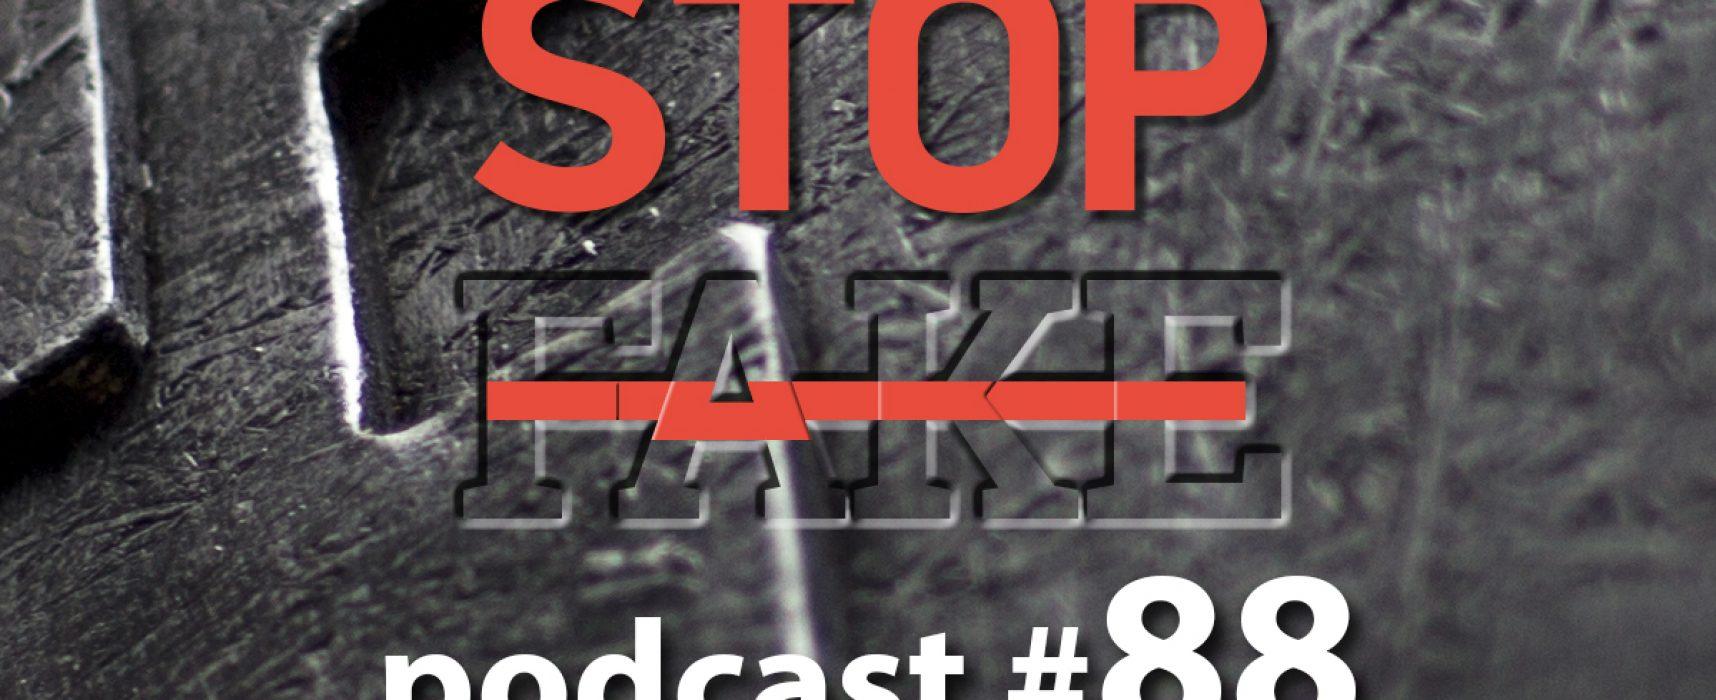 StopFake podcast #88